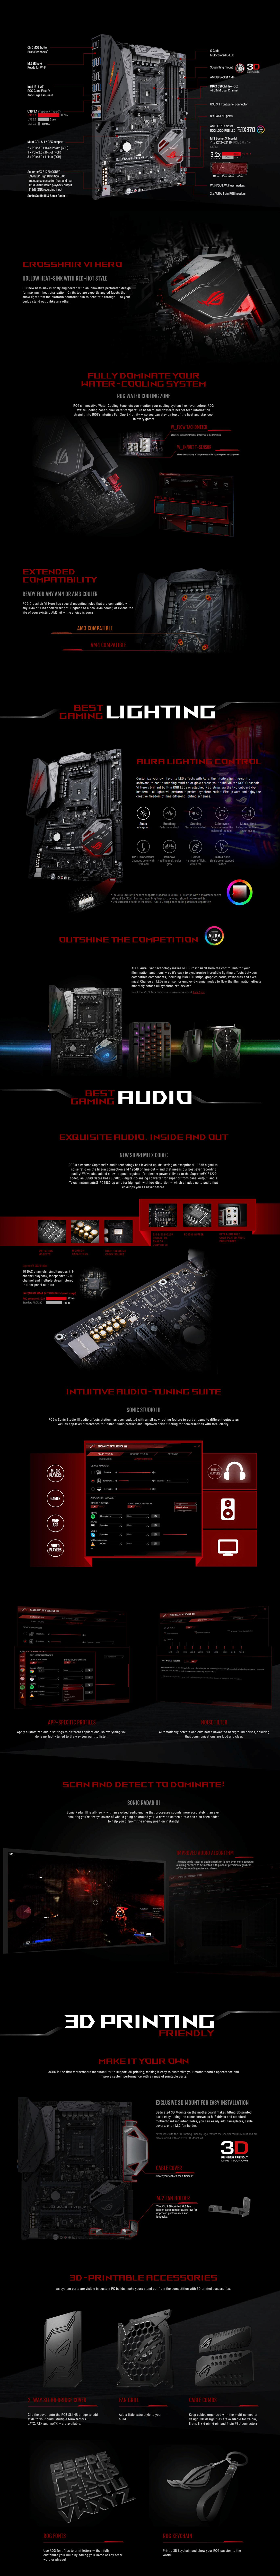 Asus X370 Crosshair VI Hero AMD Ryzen Socket AM4 ATX Desktop Motherboard